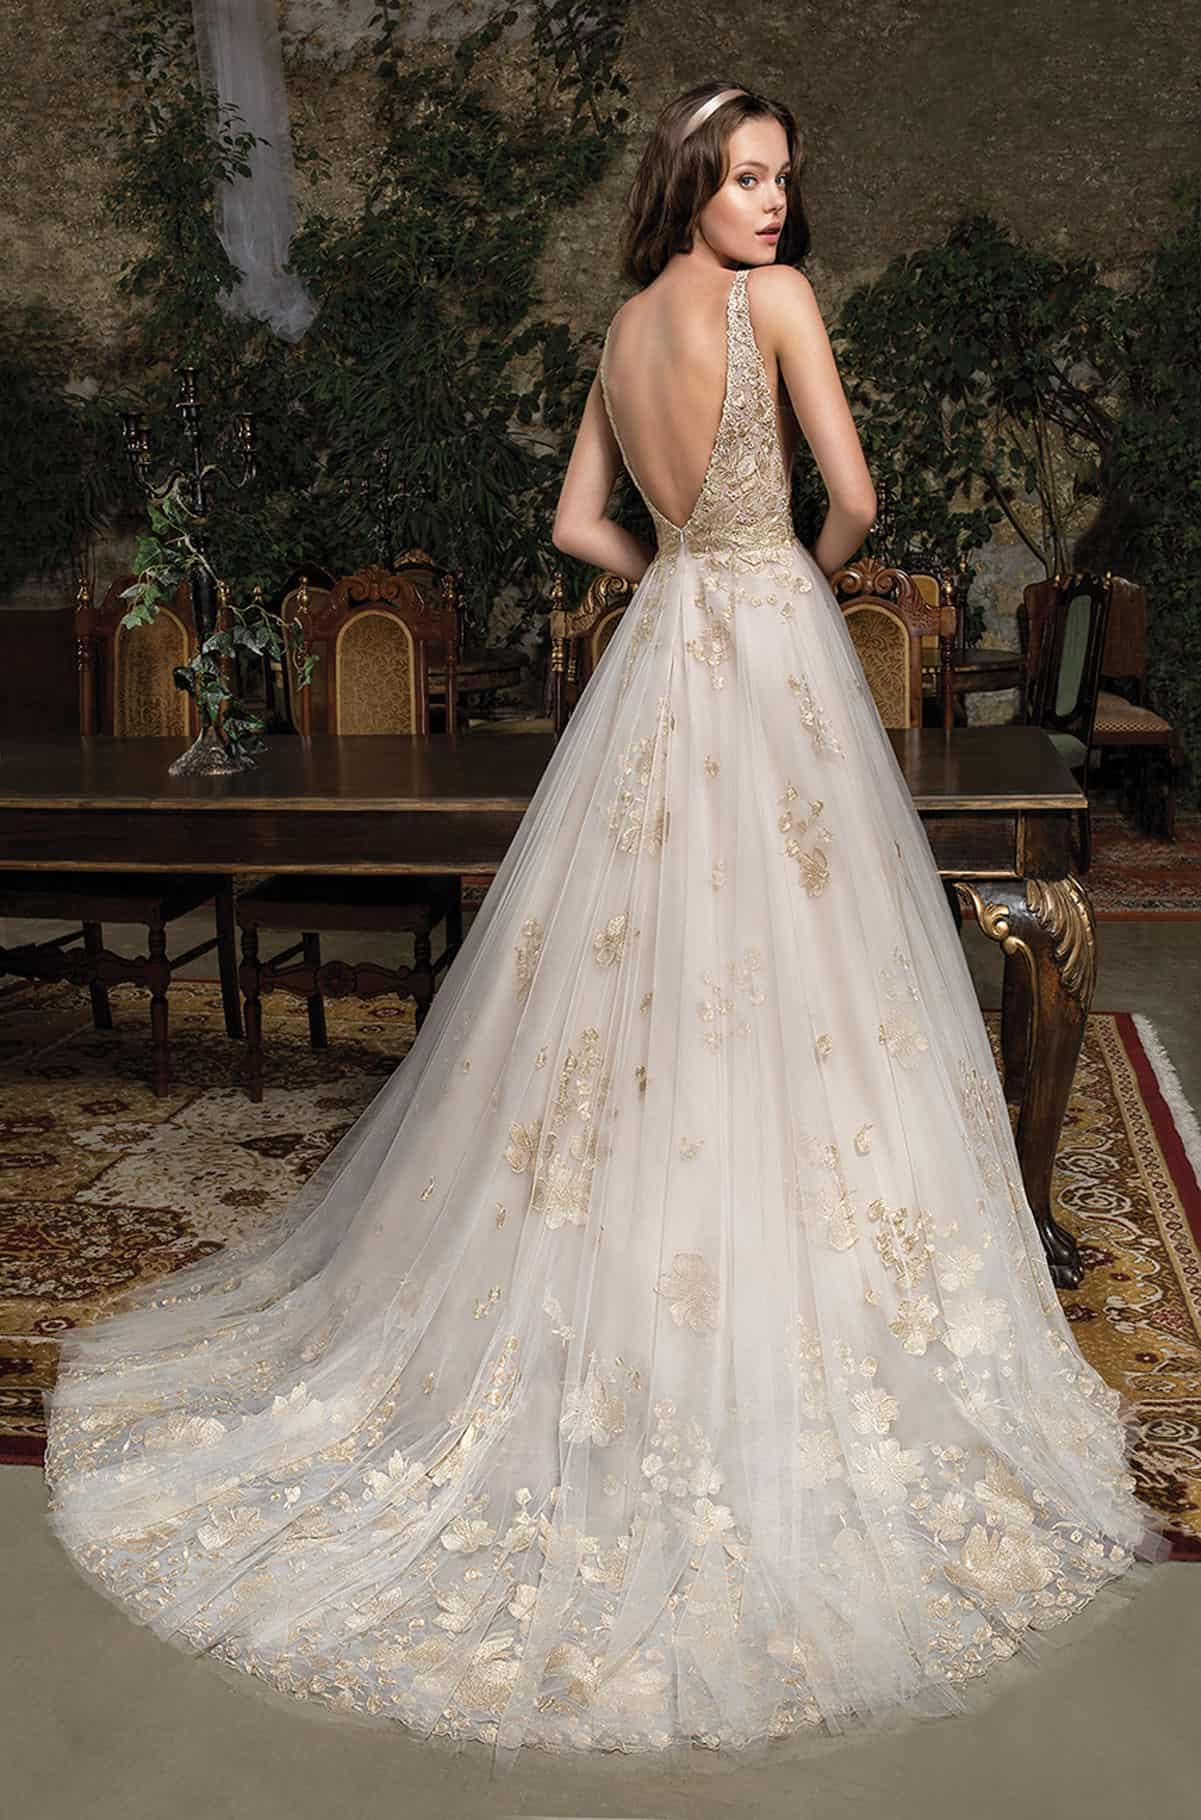 Cosmobella 7944 | Brautkleid Romantik | Hochzeitskleid A-Linie | Brautmode Köln Anna Moda